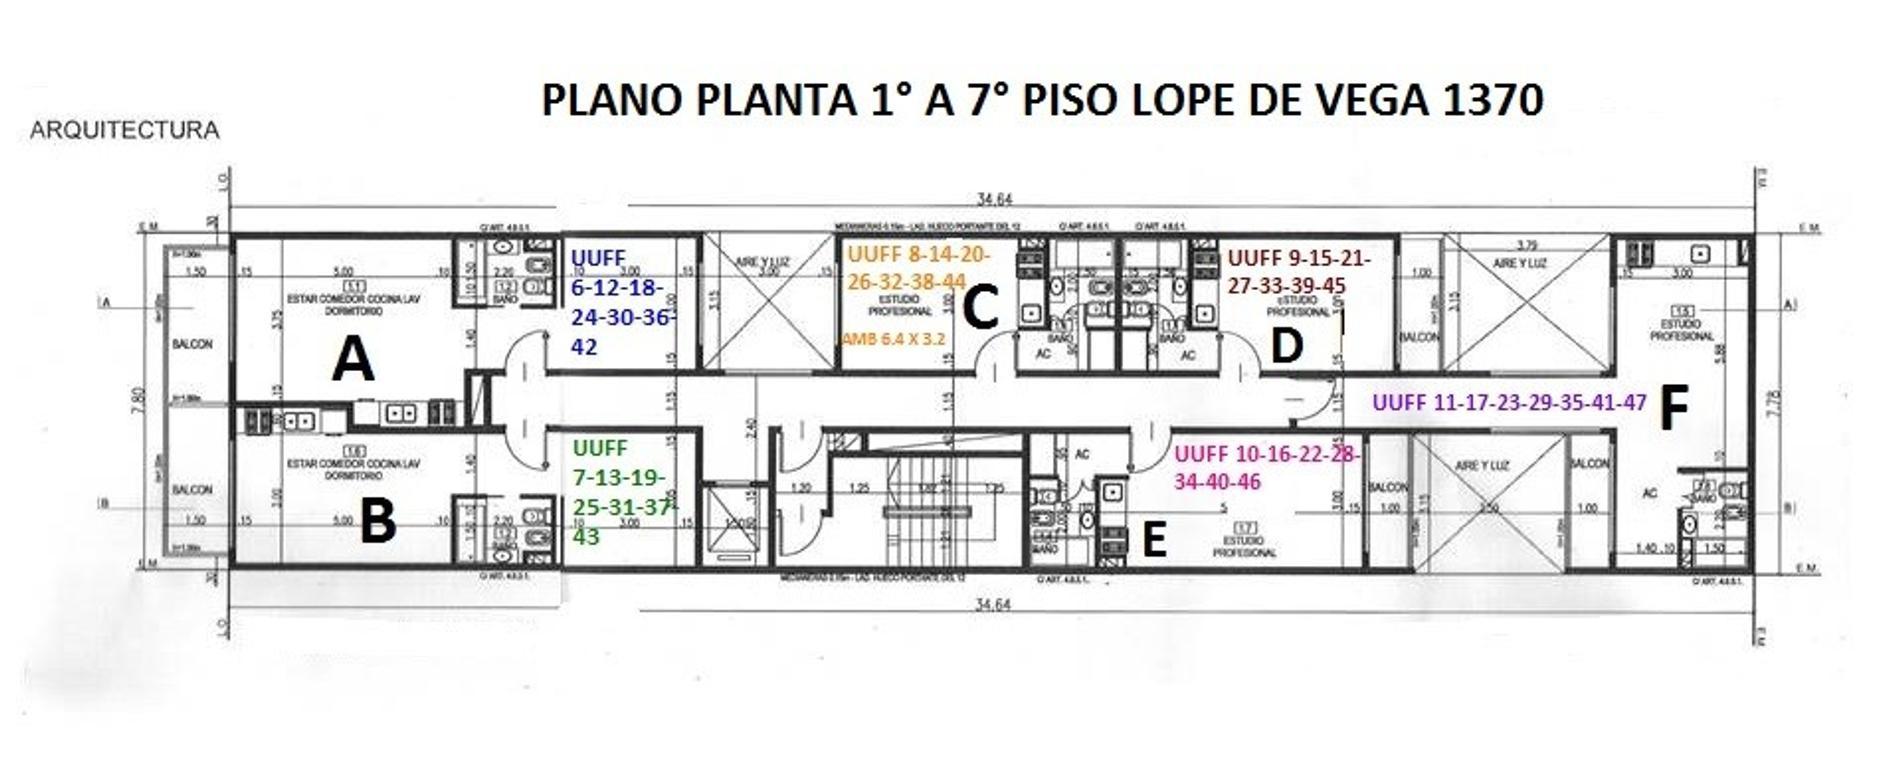 XINTEL(NIR-NIR-1036) Departamento - Venta - Argentina, Capital Federal - AV. LOPE DE VEGA  AL 1300